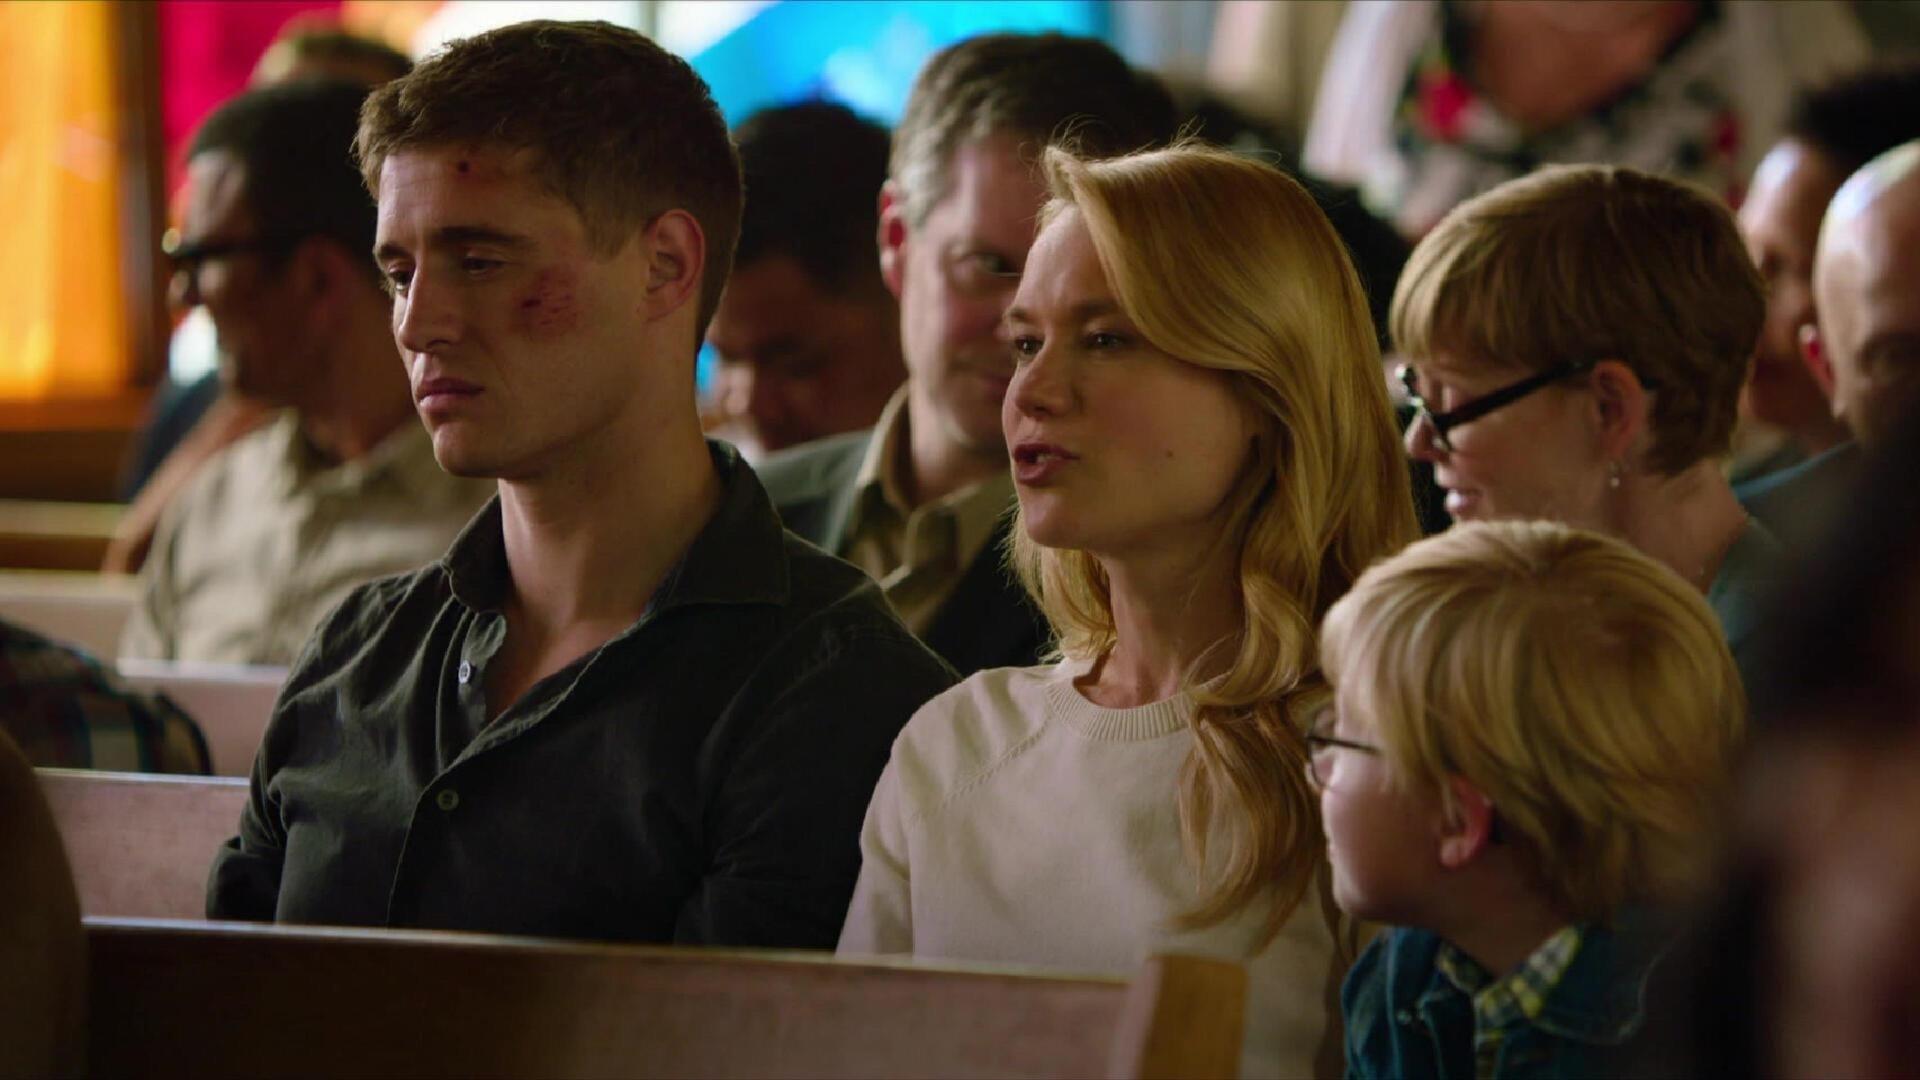 Watch Condor - Season 2 Episode 3 : A Former KGB Man HD free TV Show | TV Shows & Movies